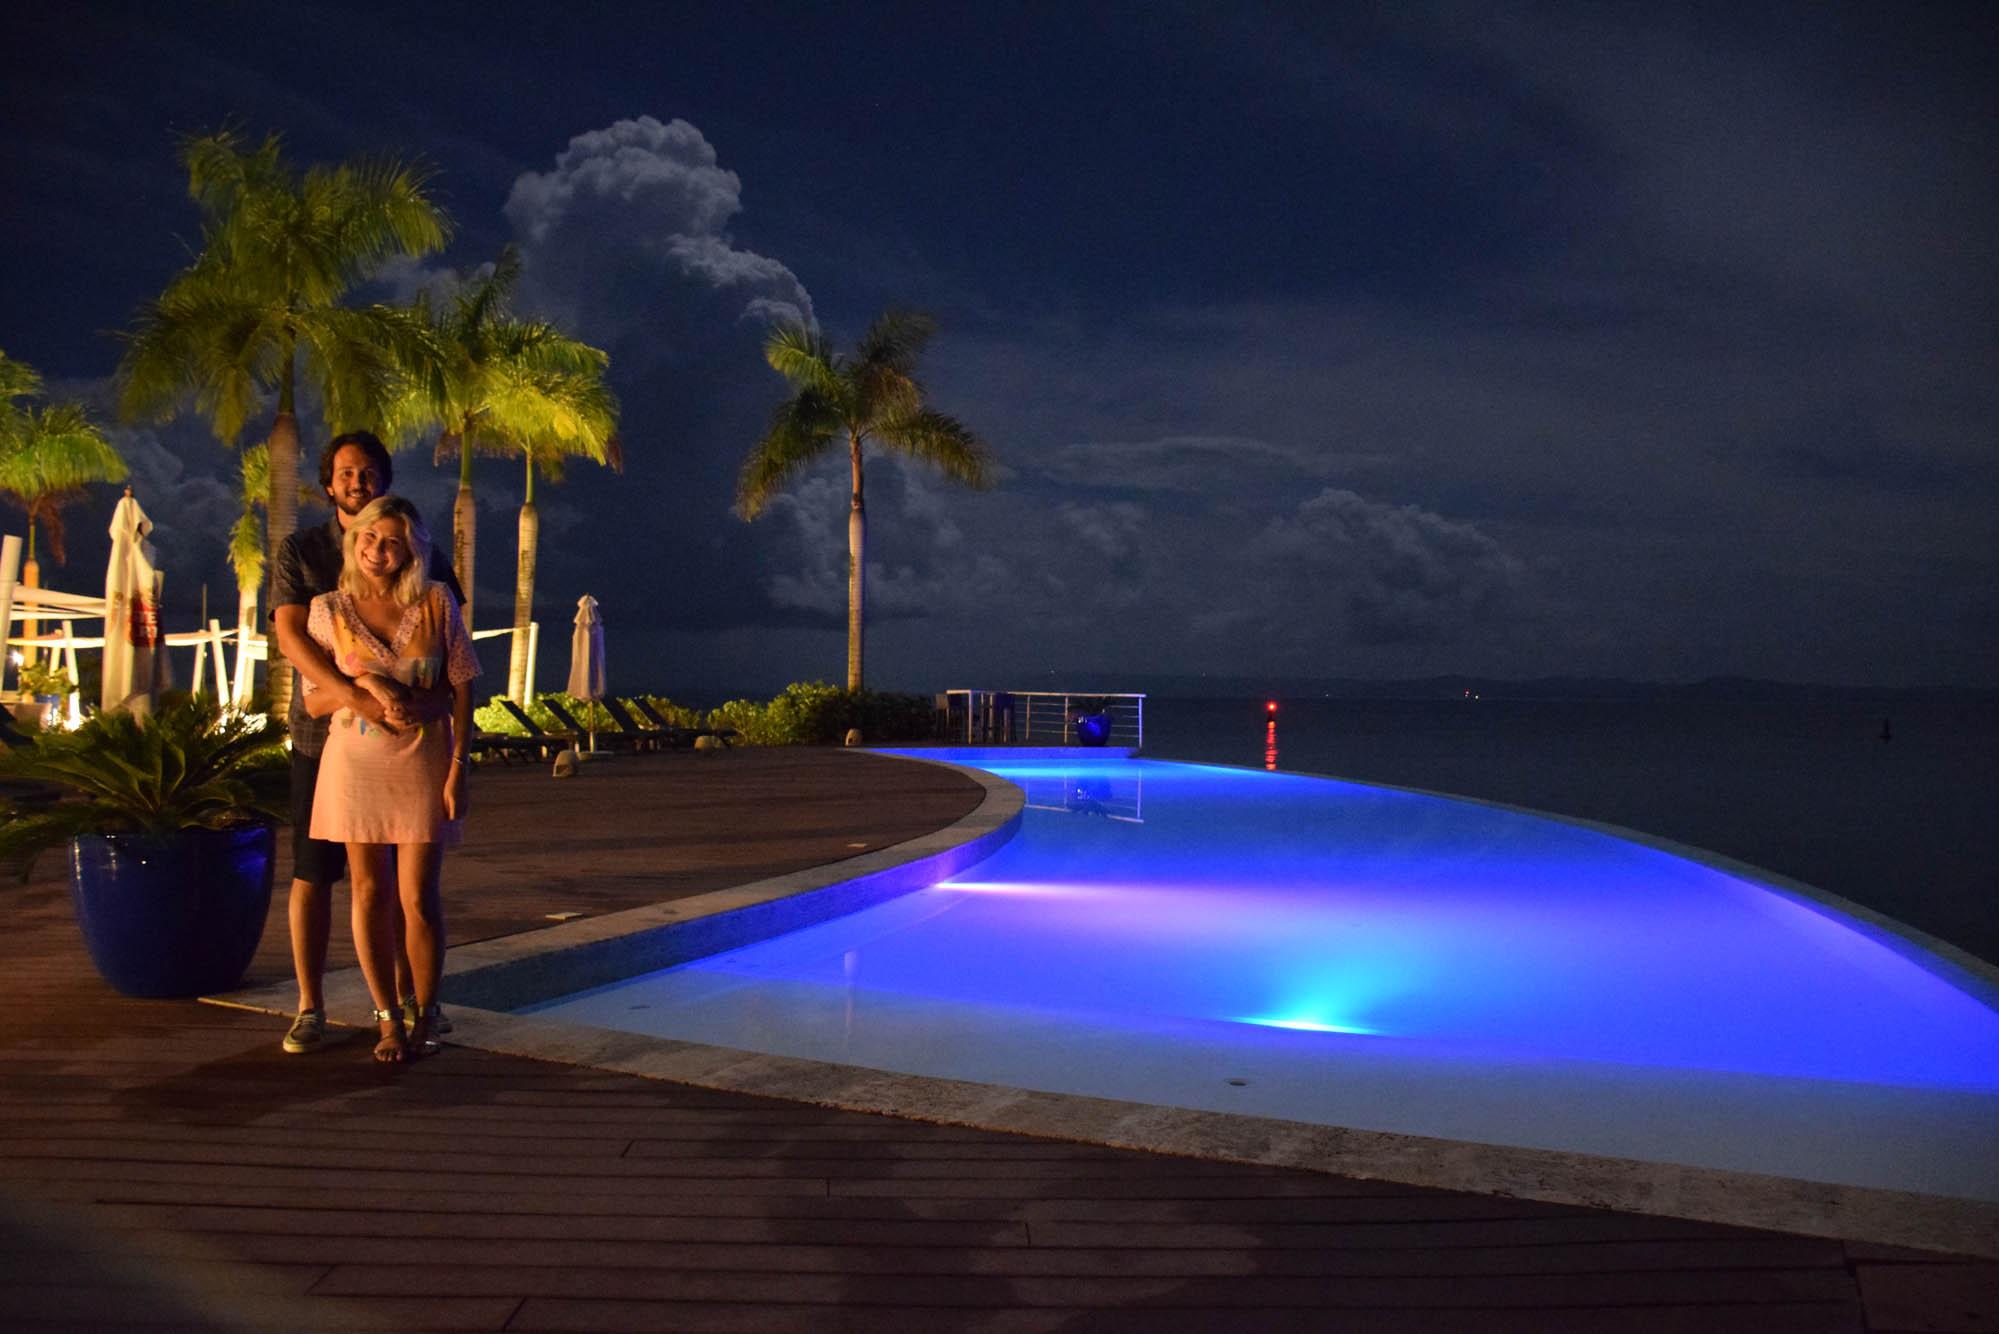 CAFE DEL MAR - BANNISTER HOTEL - PUERTO BAHIA - SAMANA - REPUBLICA DOMINICANA